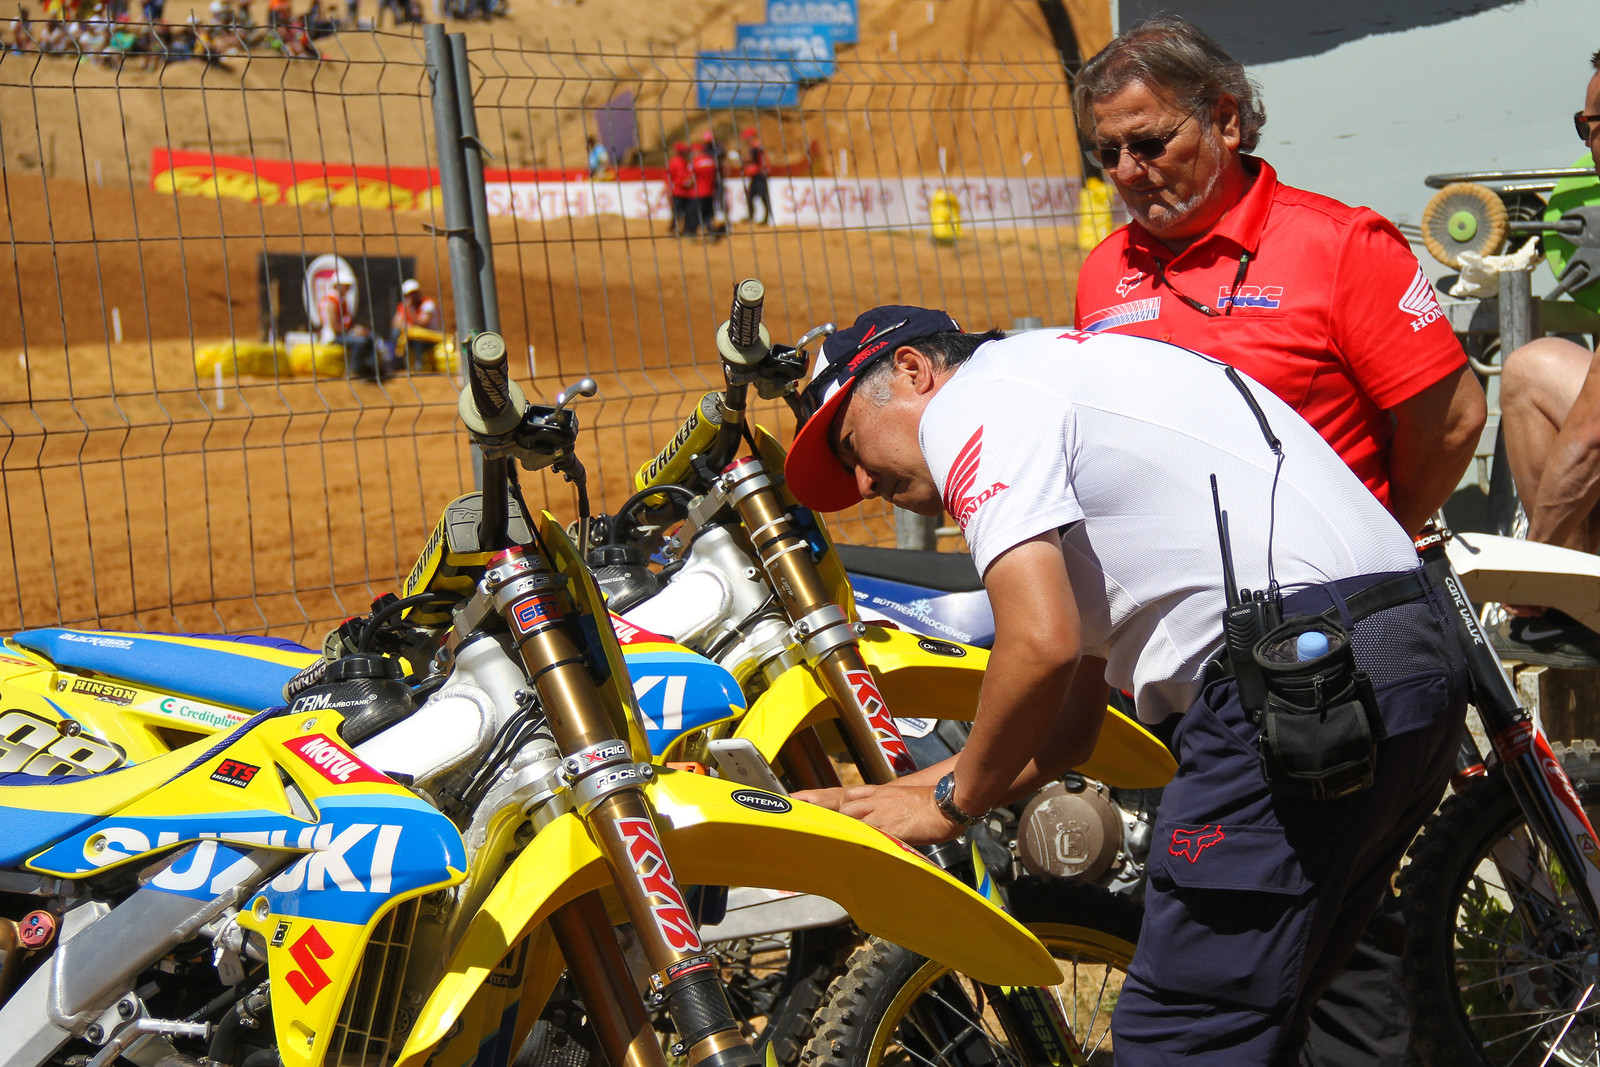 Honda team examining Suzuki - ayearinmx - Motocross Pictures - Vital MX